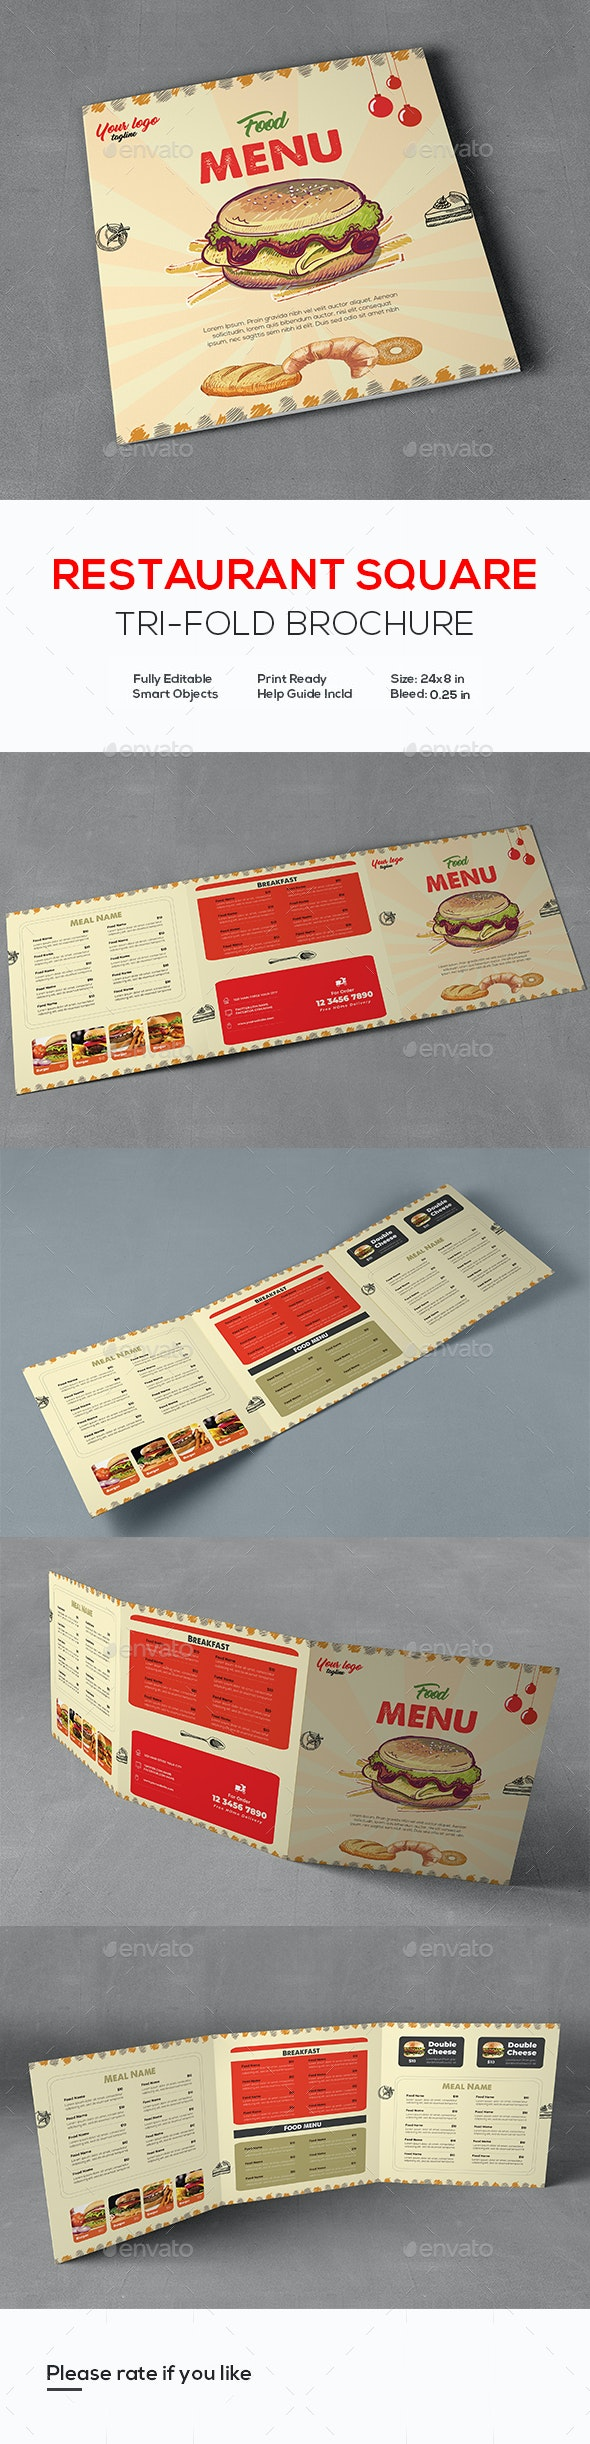 Square Food Menu Trifold Brochure - Food Menus Print Templates